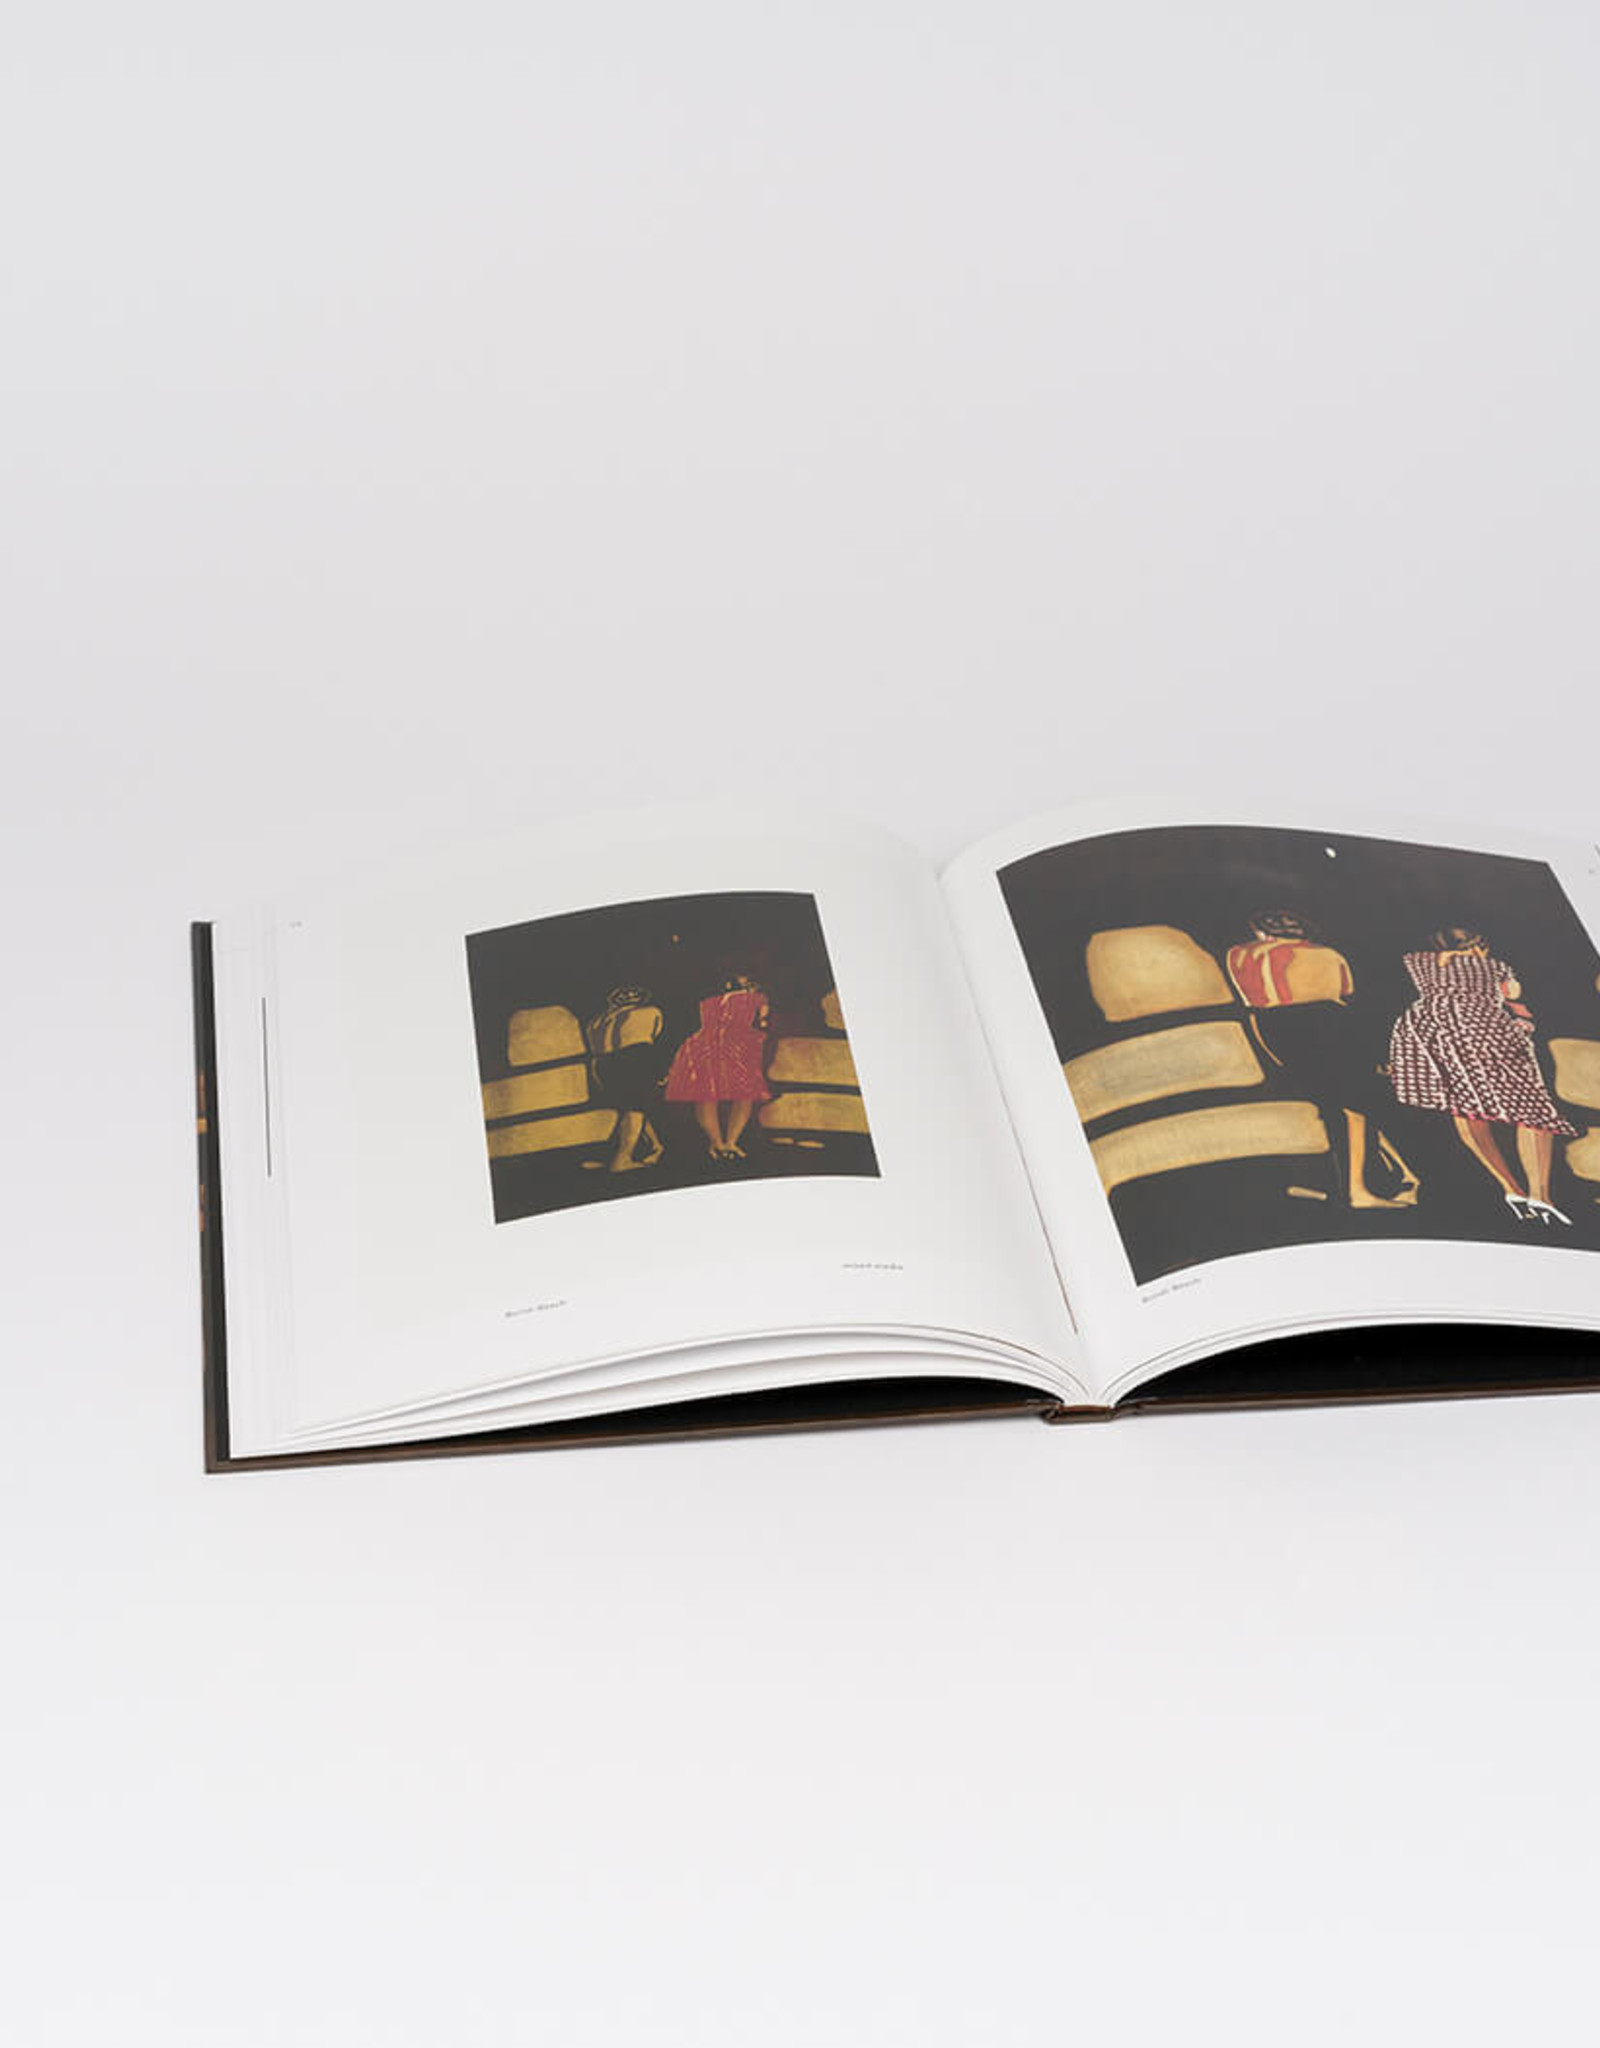 Bruno Vekemans - Stilte alom